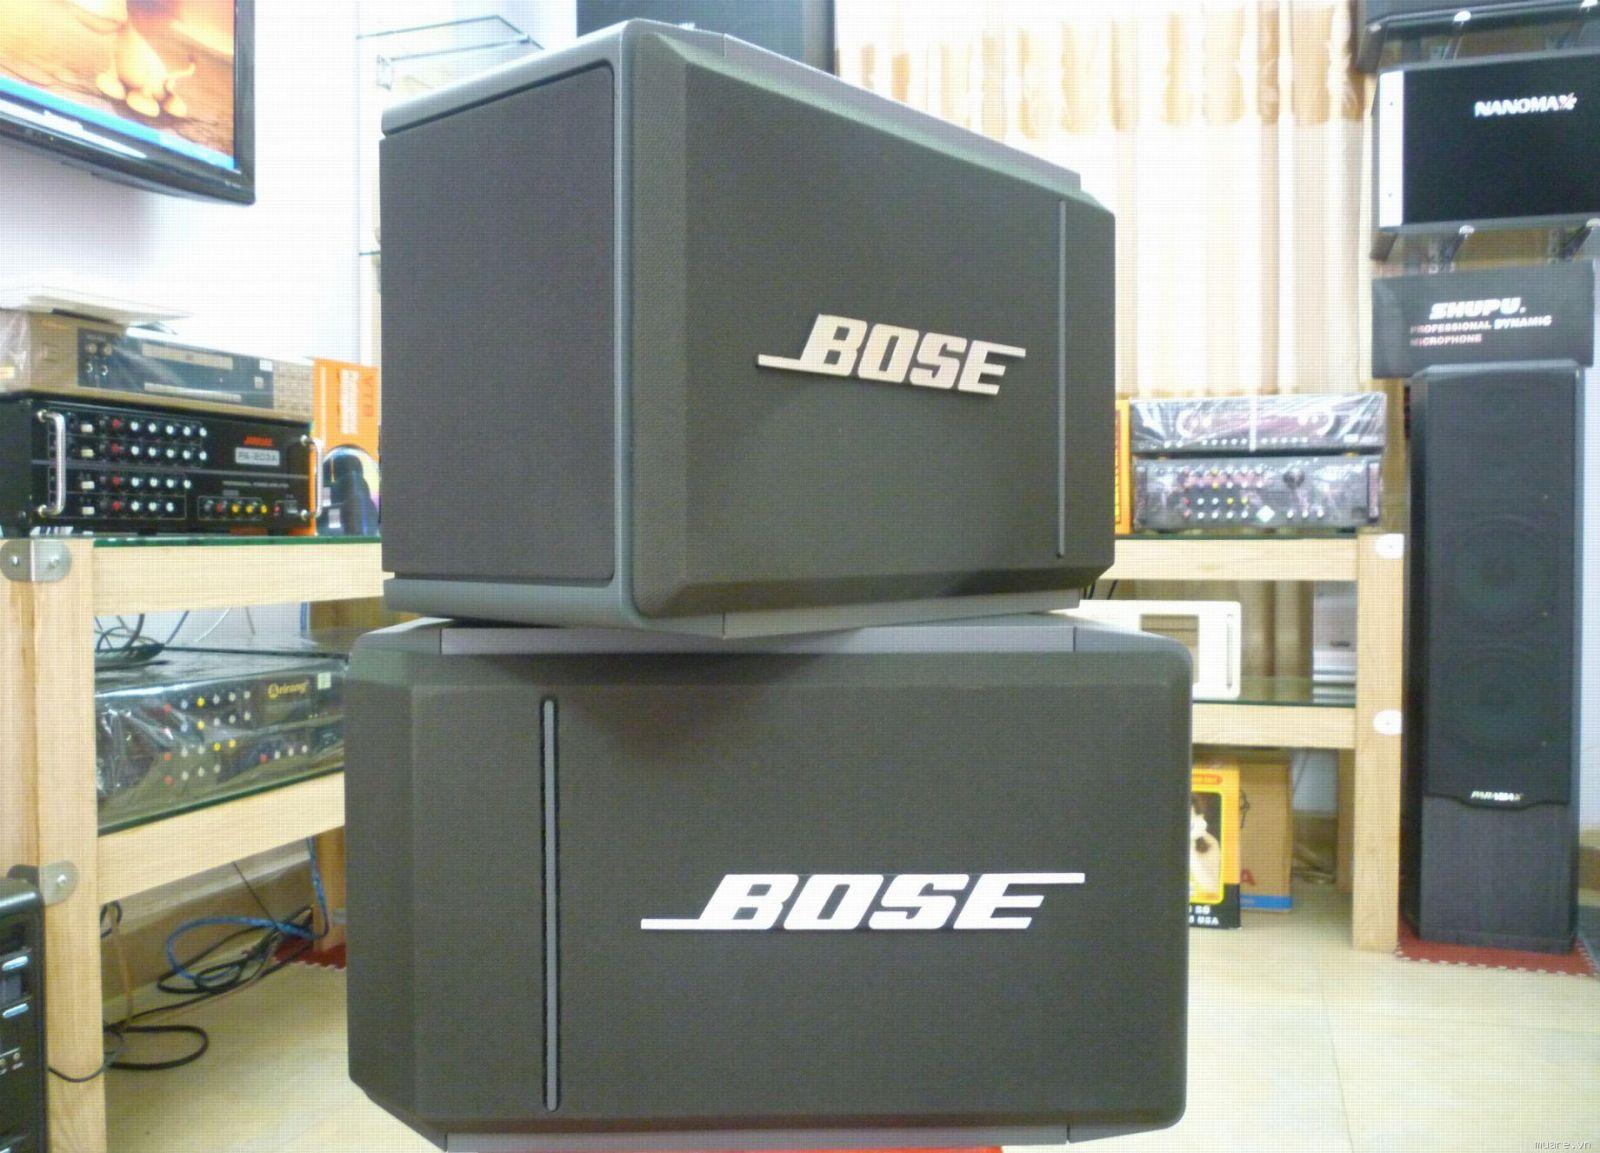 Loa hát karaoke hãng Bose